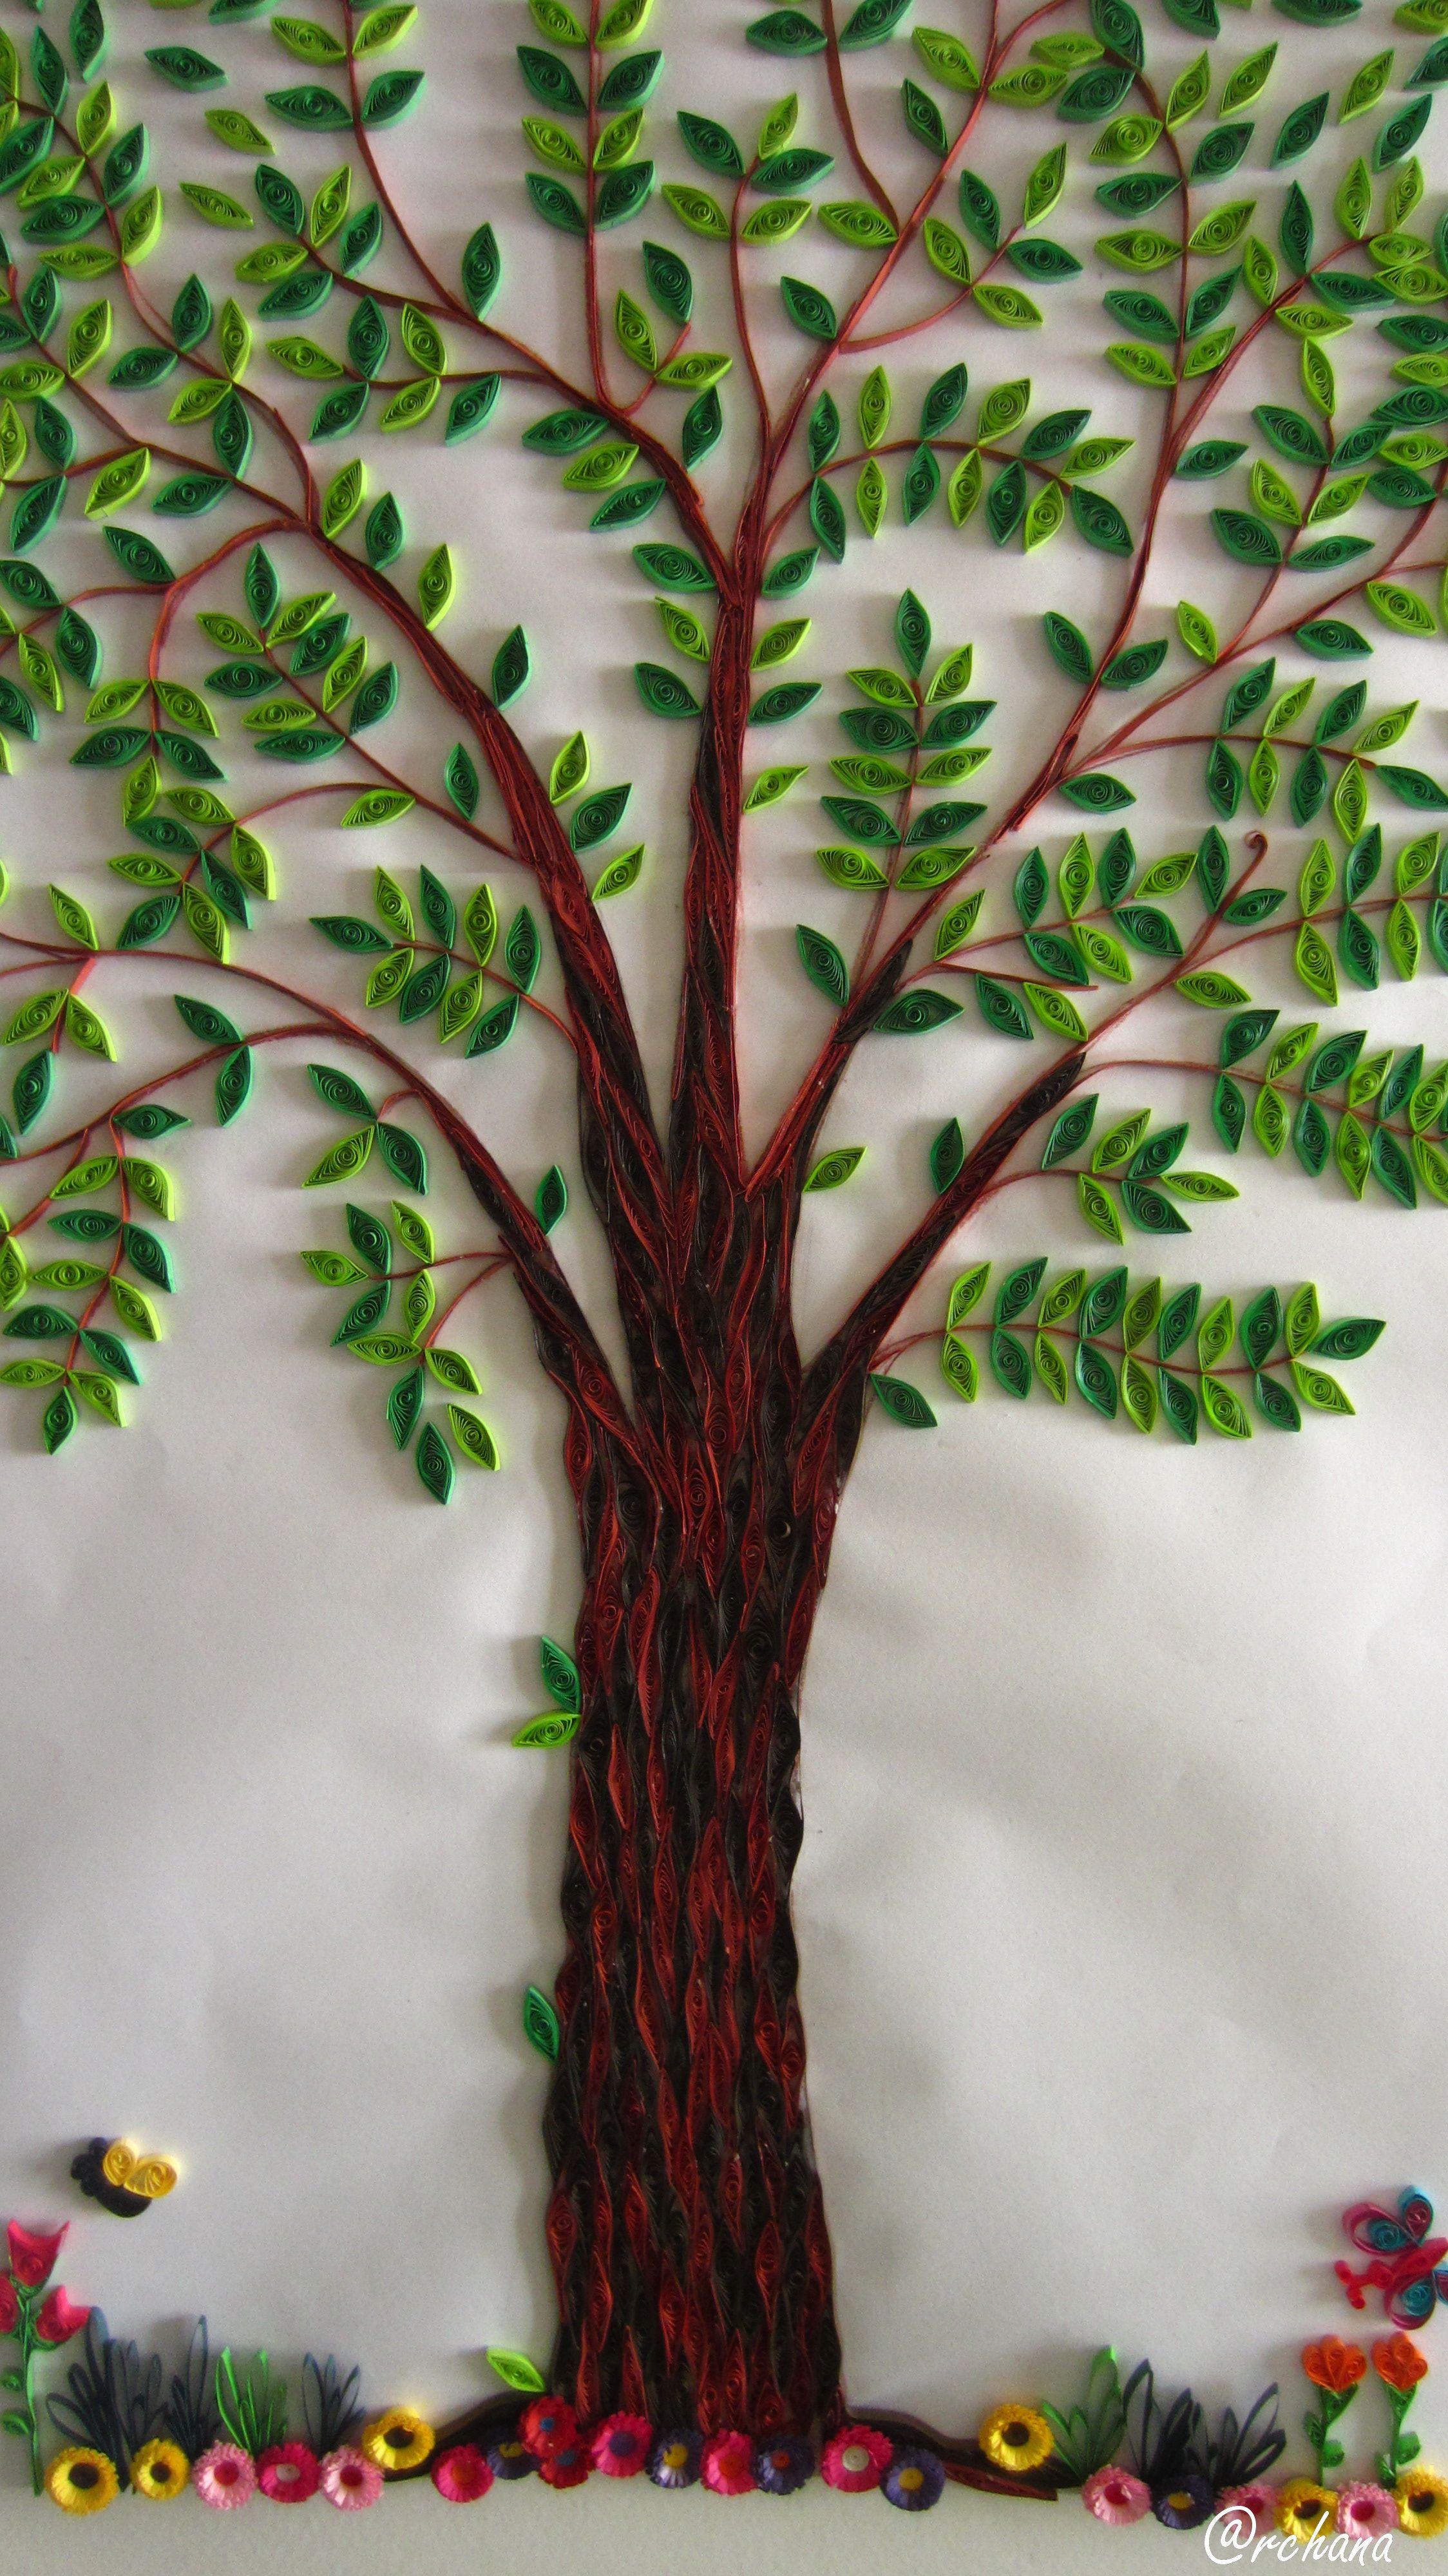 My quilled tree | paper art الفنون الورقية | Pinterest | Quilling ...